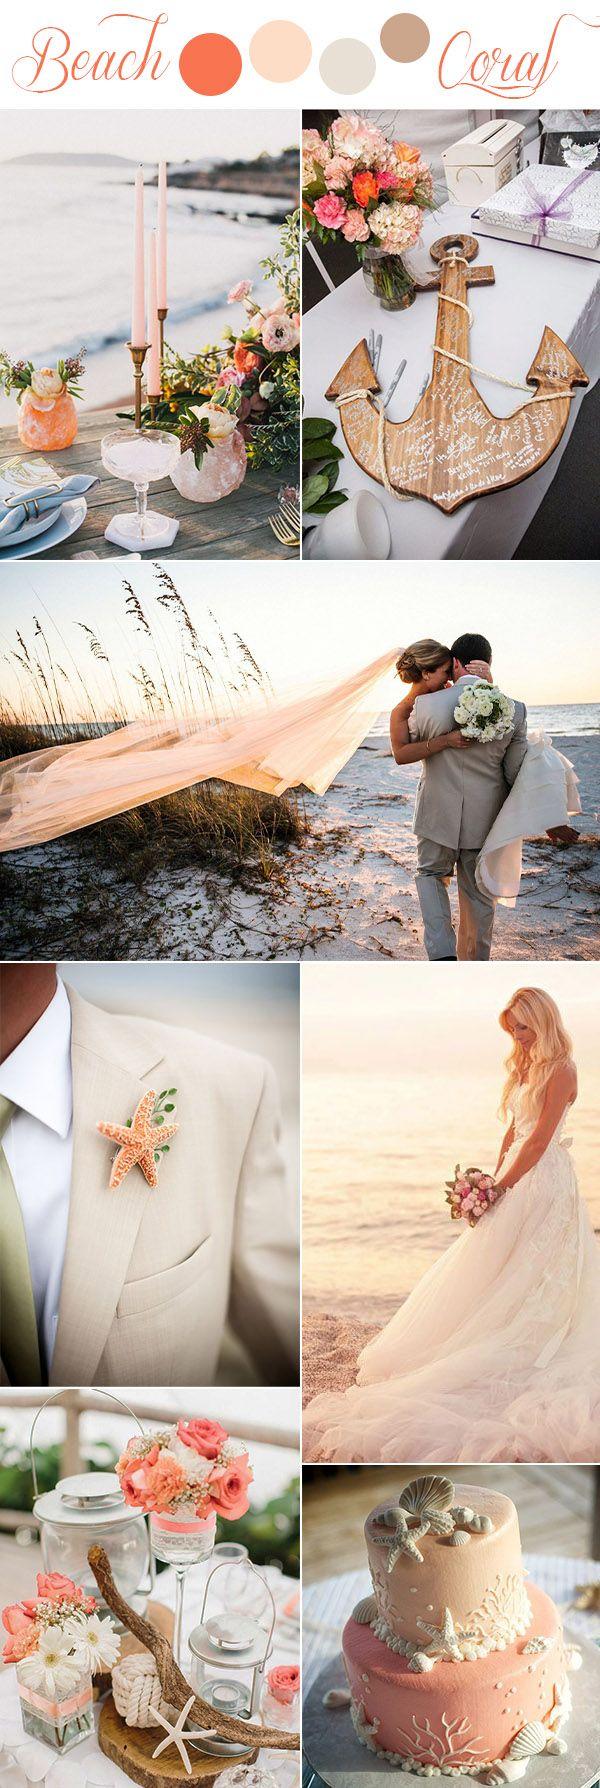 best beach wedding locations on budget%0A   Gorgeous Rustic Romantic and Elegant Wedding Ideas  u     Color Palettes  Beach  Themed WeddingsCoral